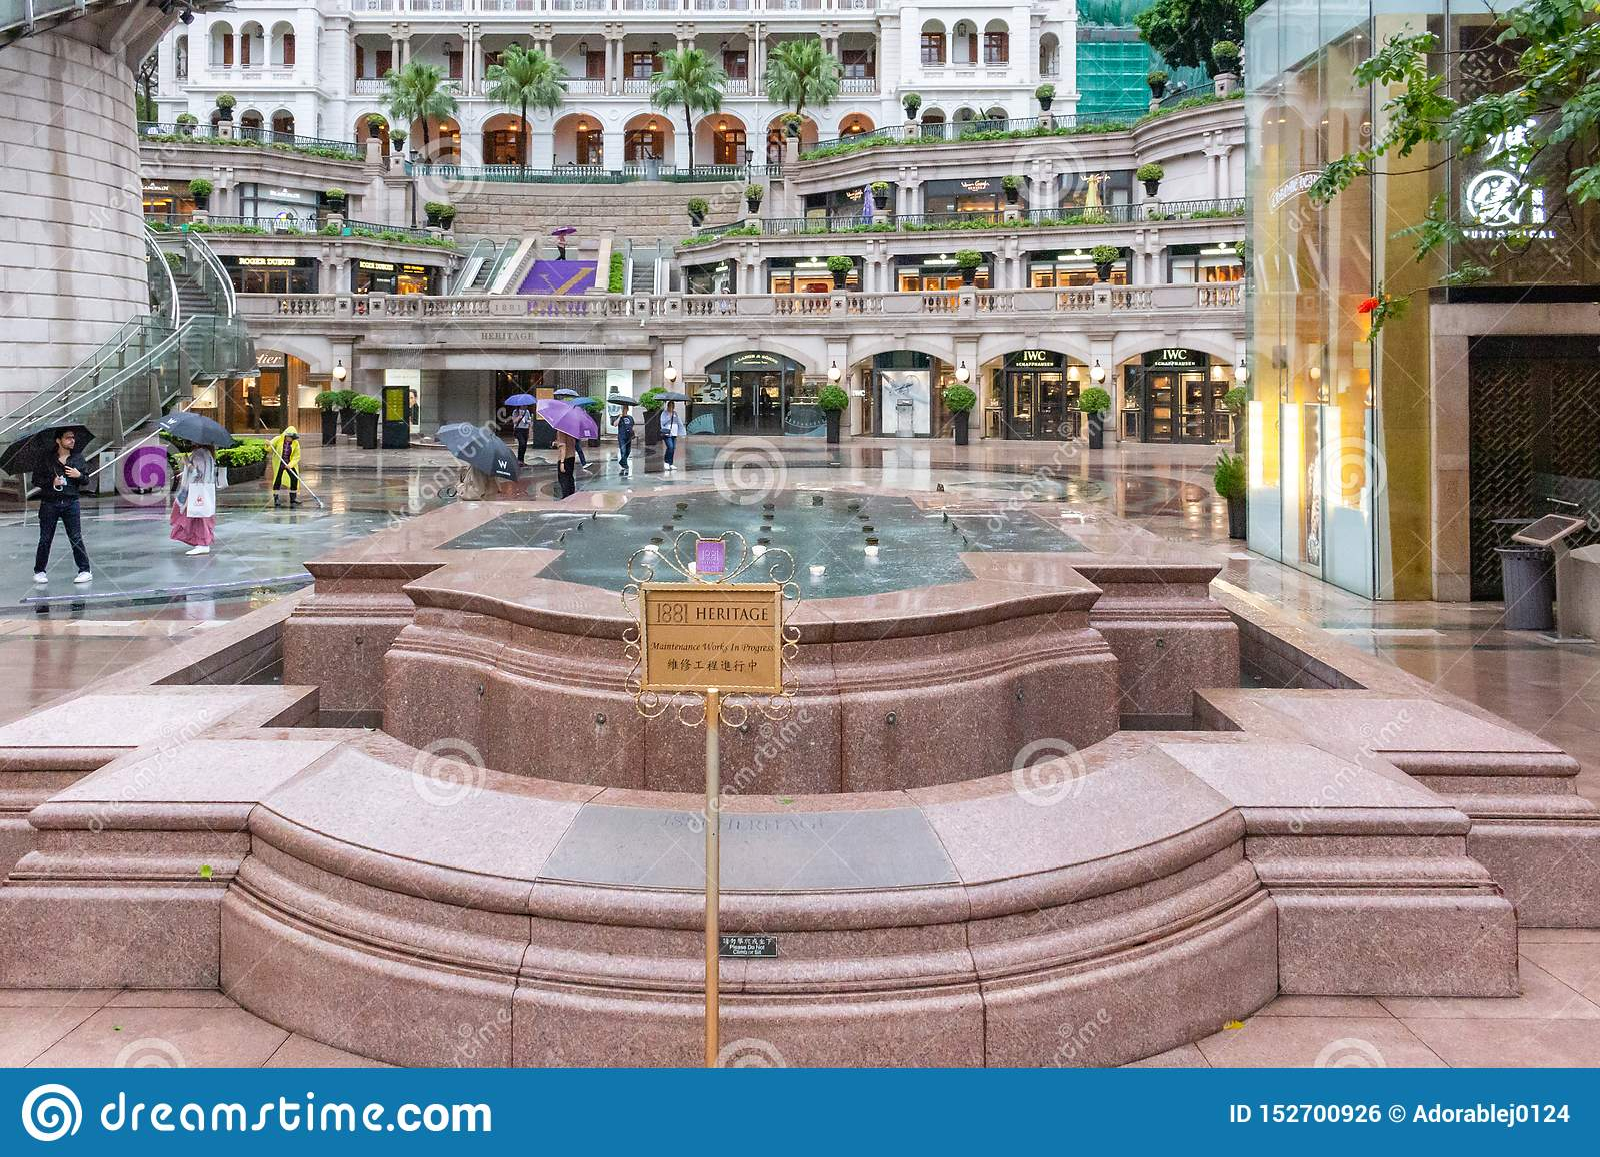 Centre commercial 1881 d héritage chez Tsim Sha Tsui, Kowloon, Hong Kong